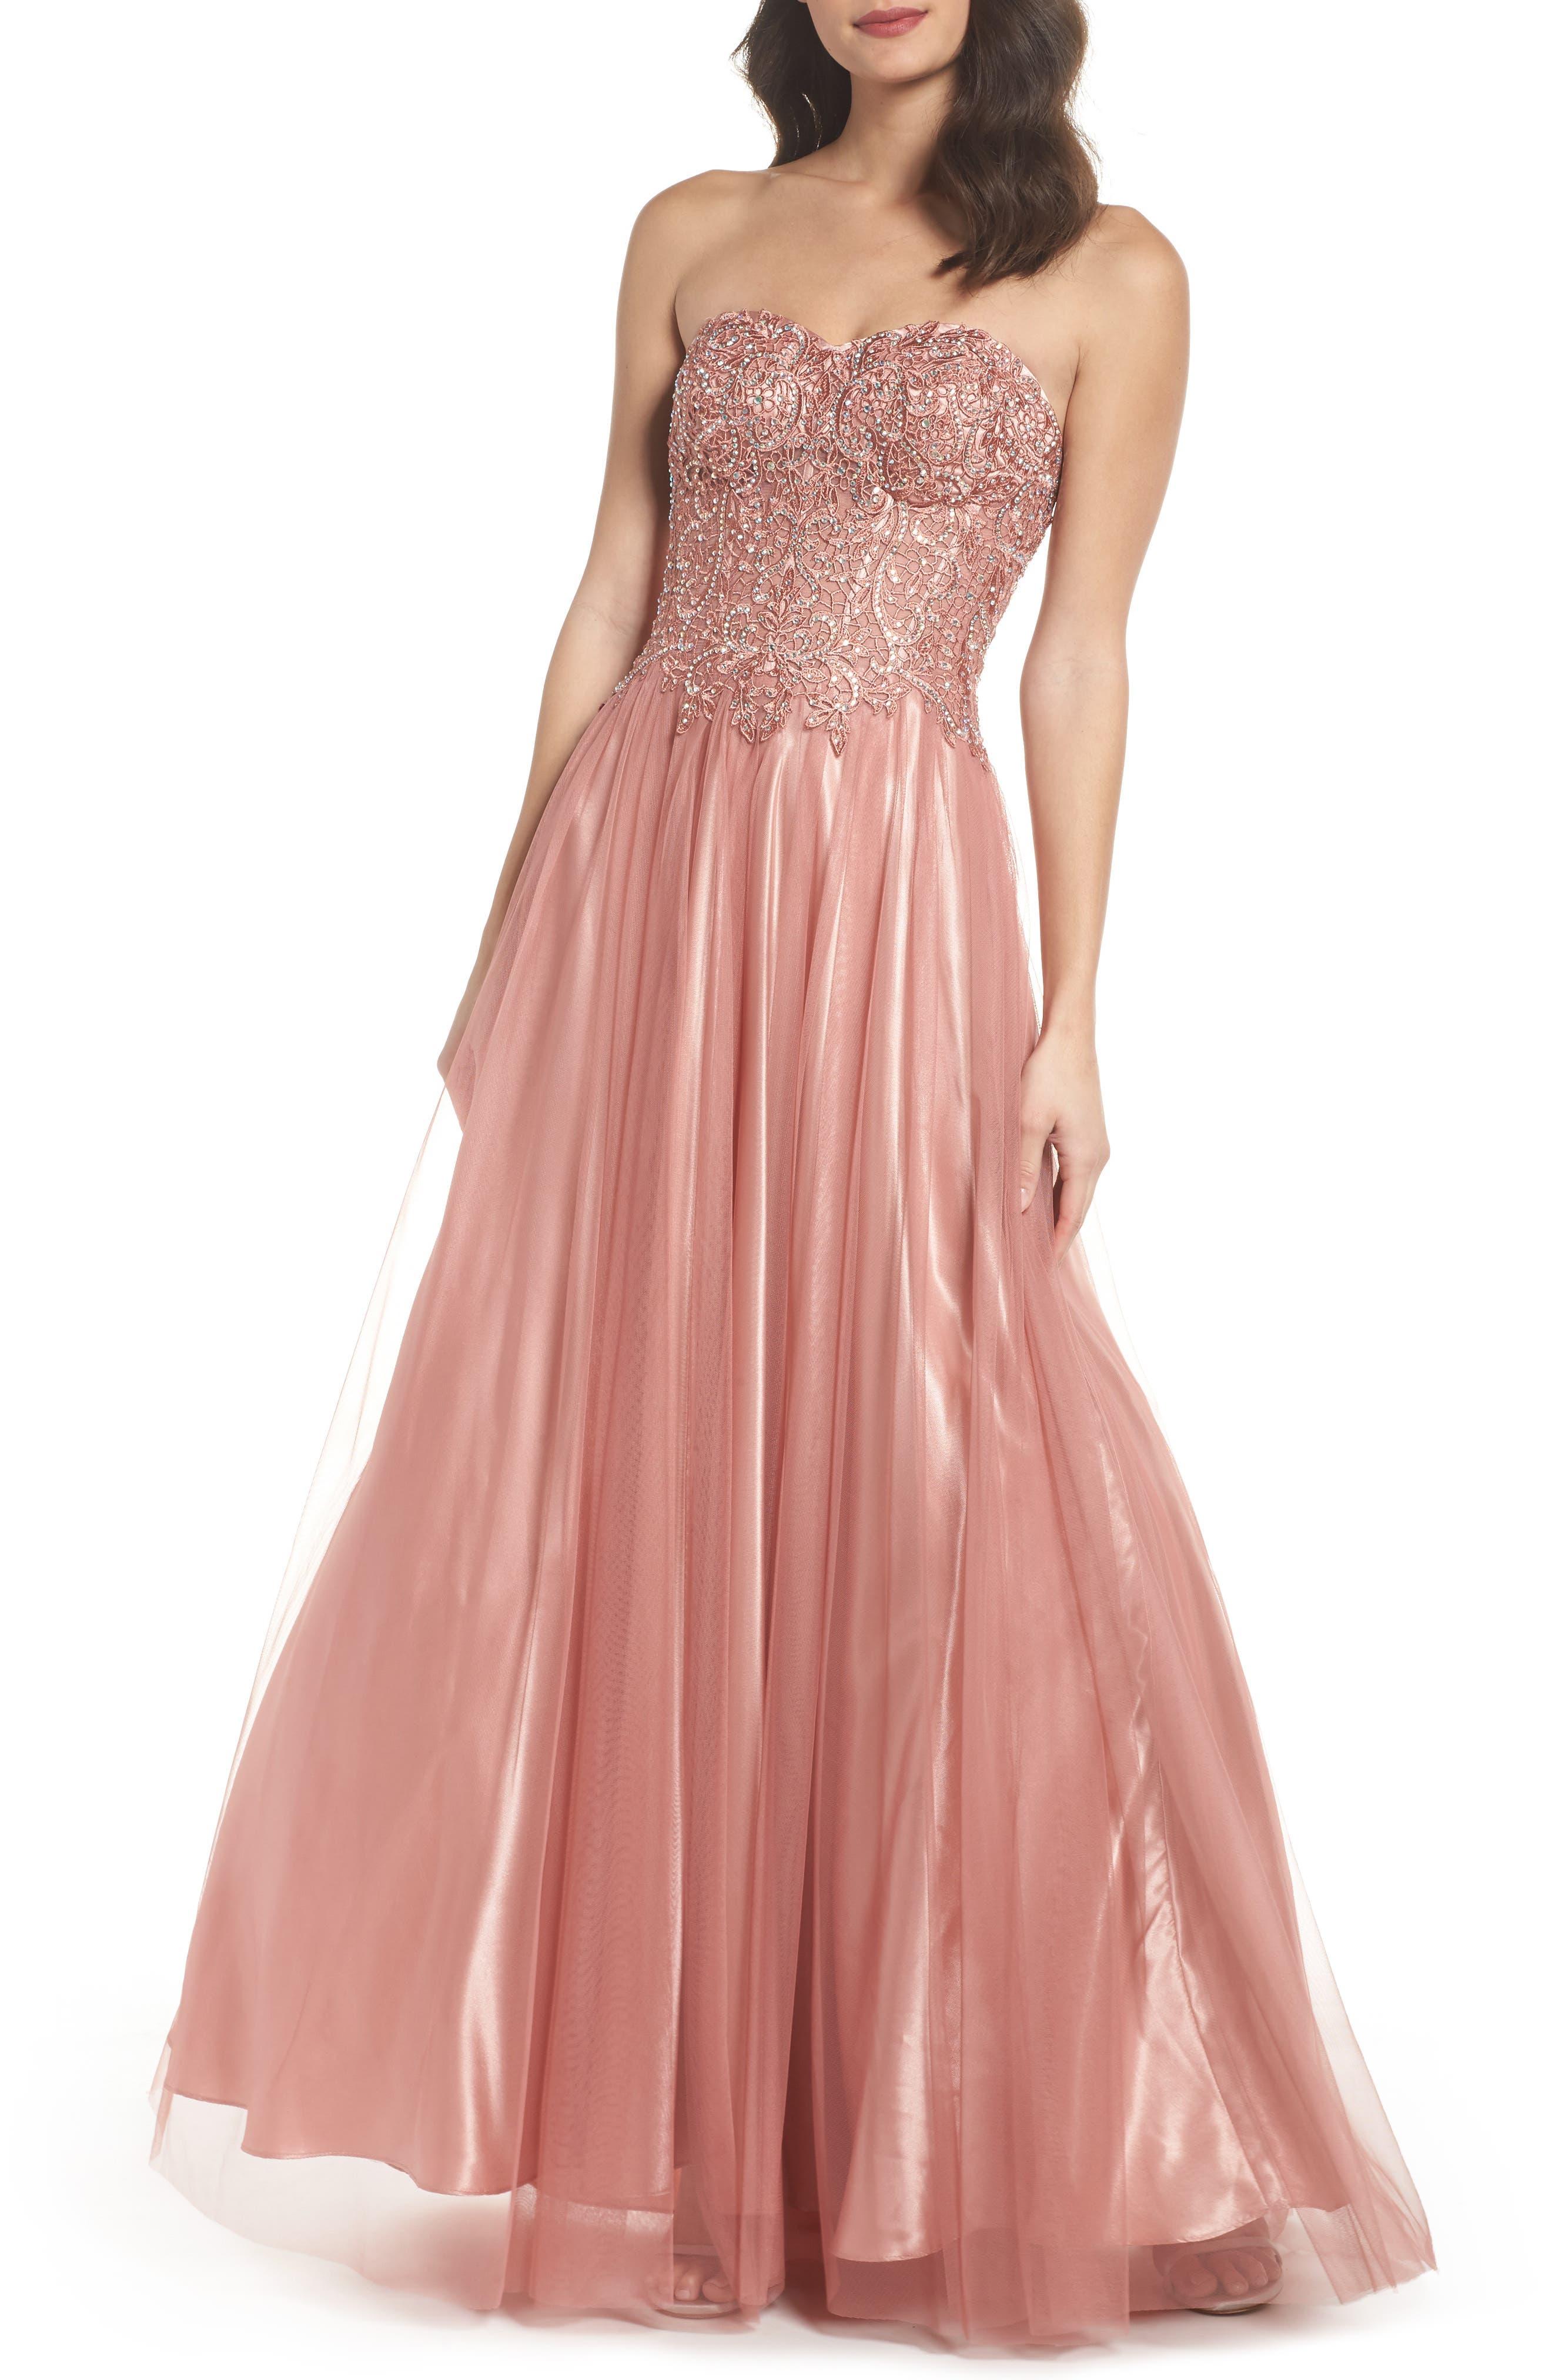 Embellished Corset Ballgown,                         Main,                         color, Rose